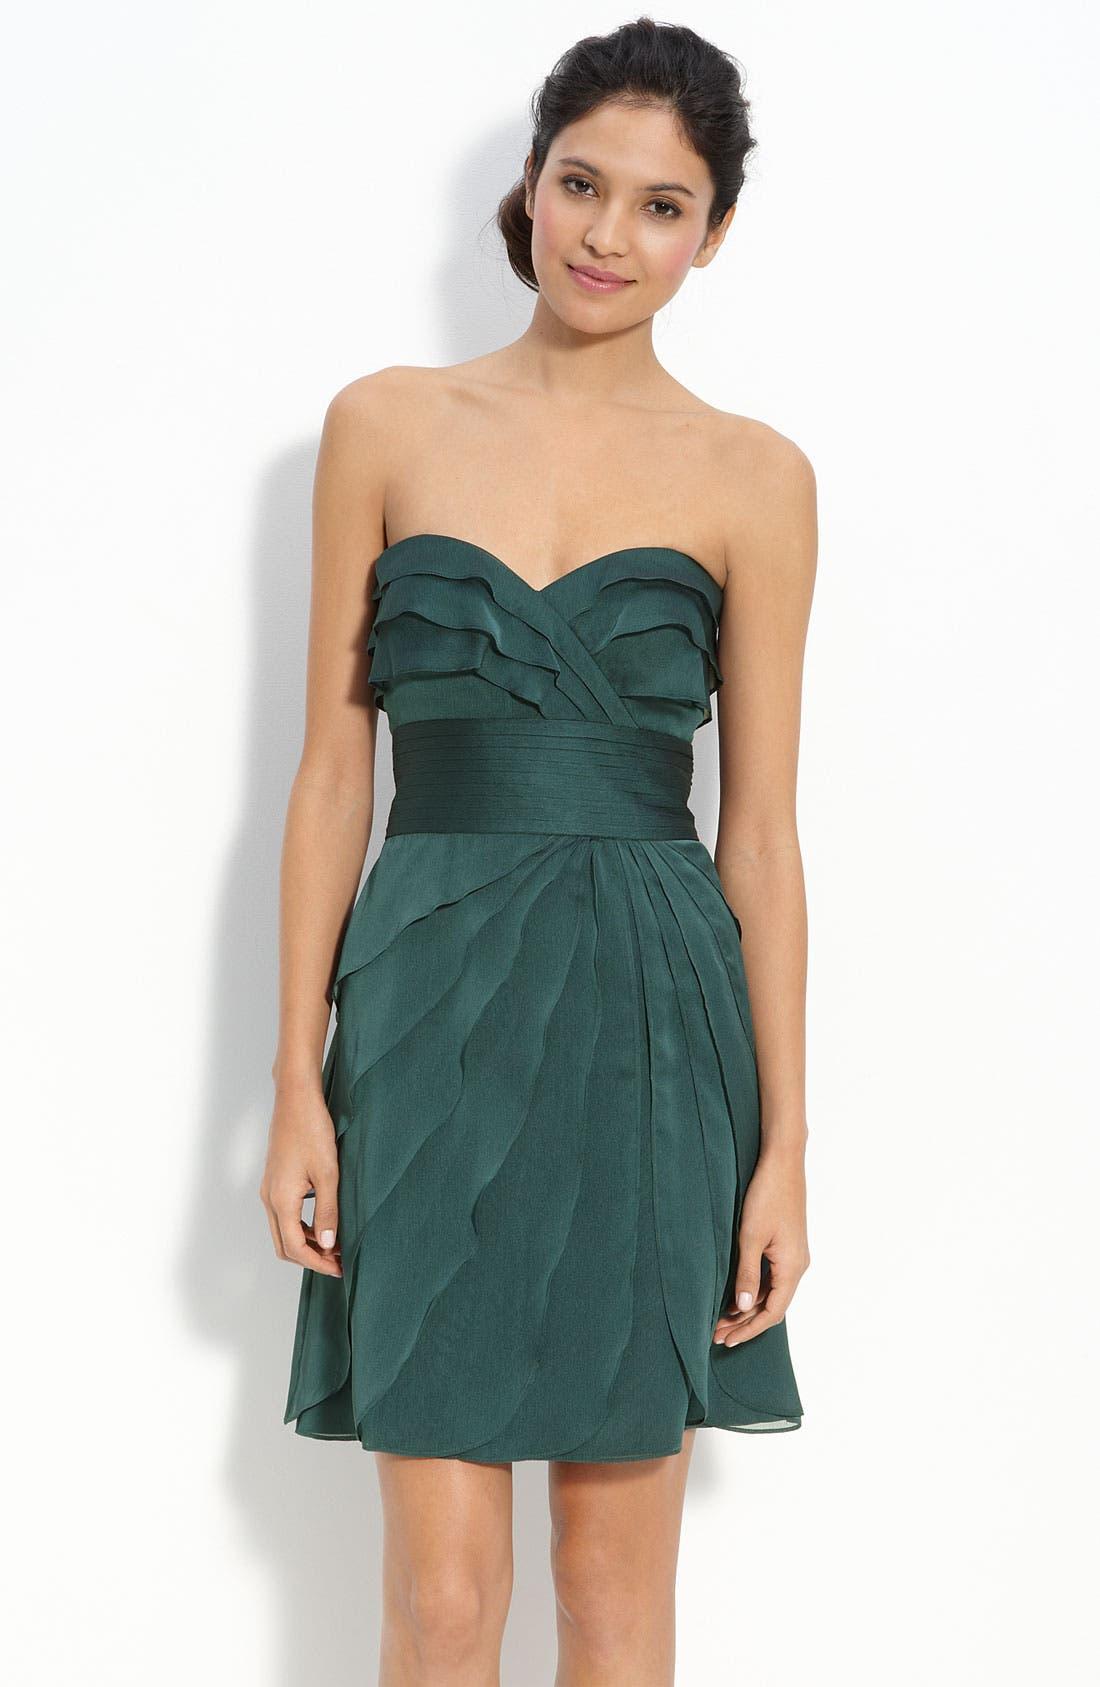 Alternate Image 1 Selected - Adrianna Papell Tiered Iridescent Chiffon Dress